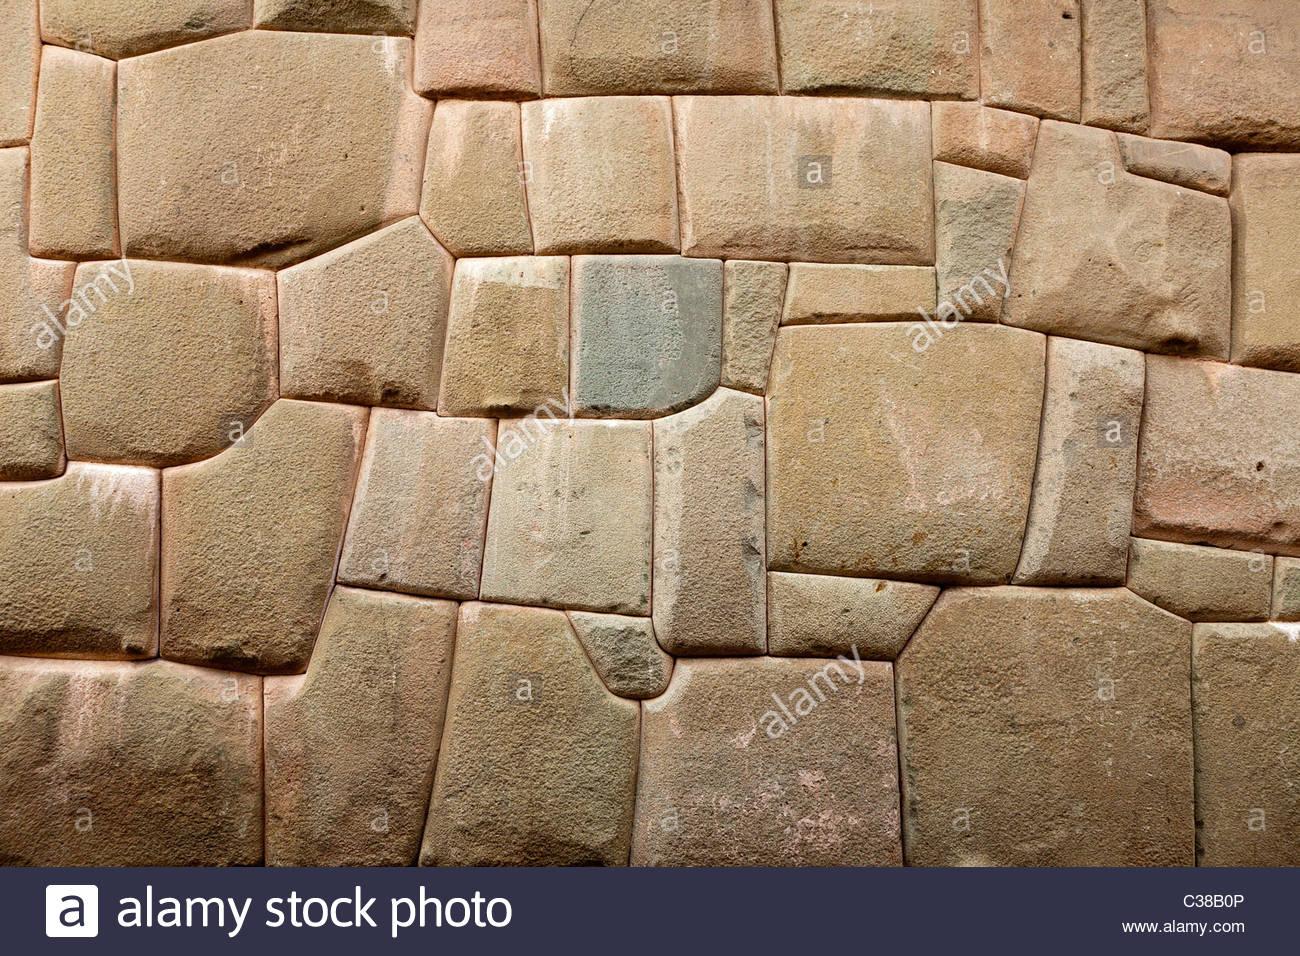 Inca stonework on the ancient palace of Inca Roca, Cusco, Peru. - Stock Image